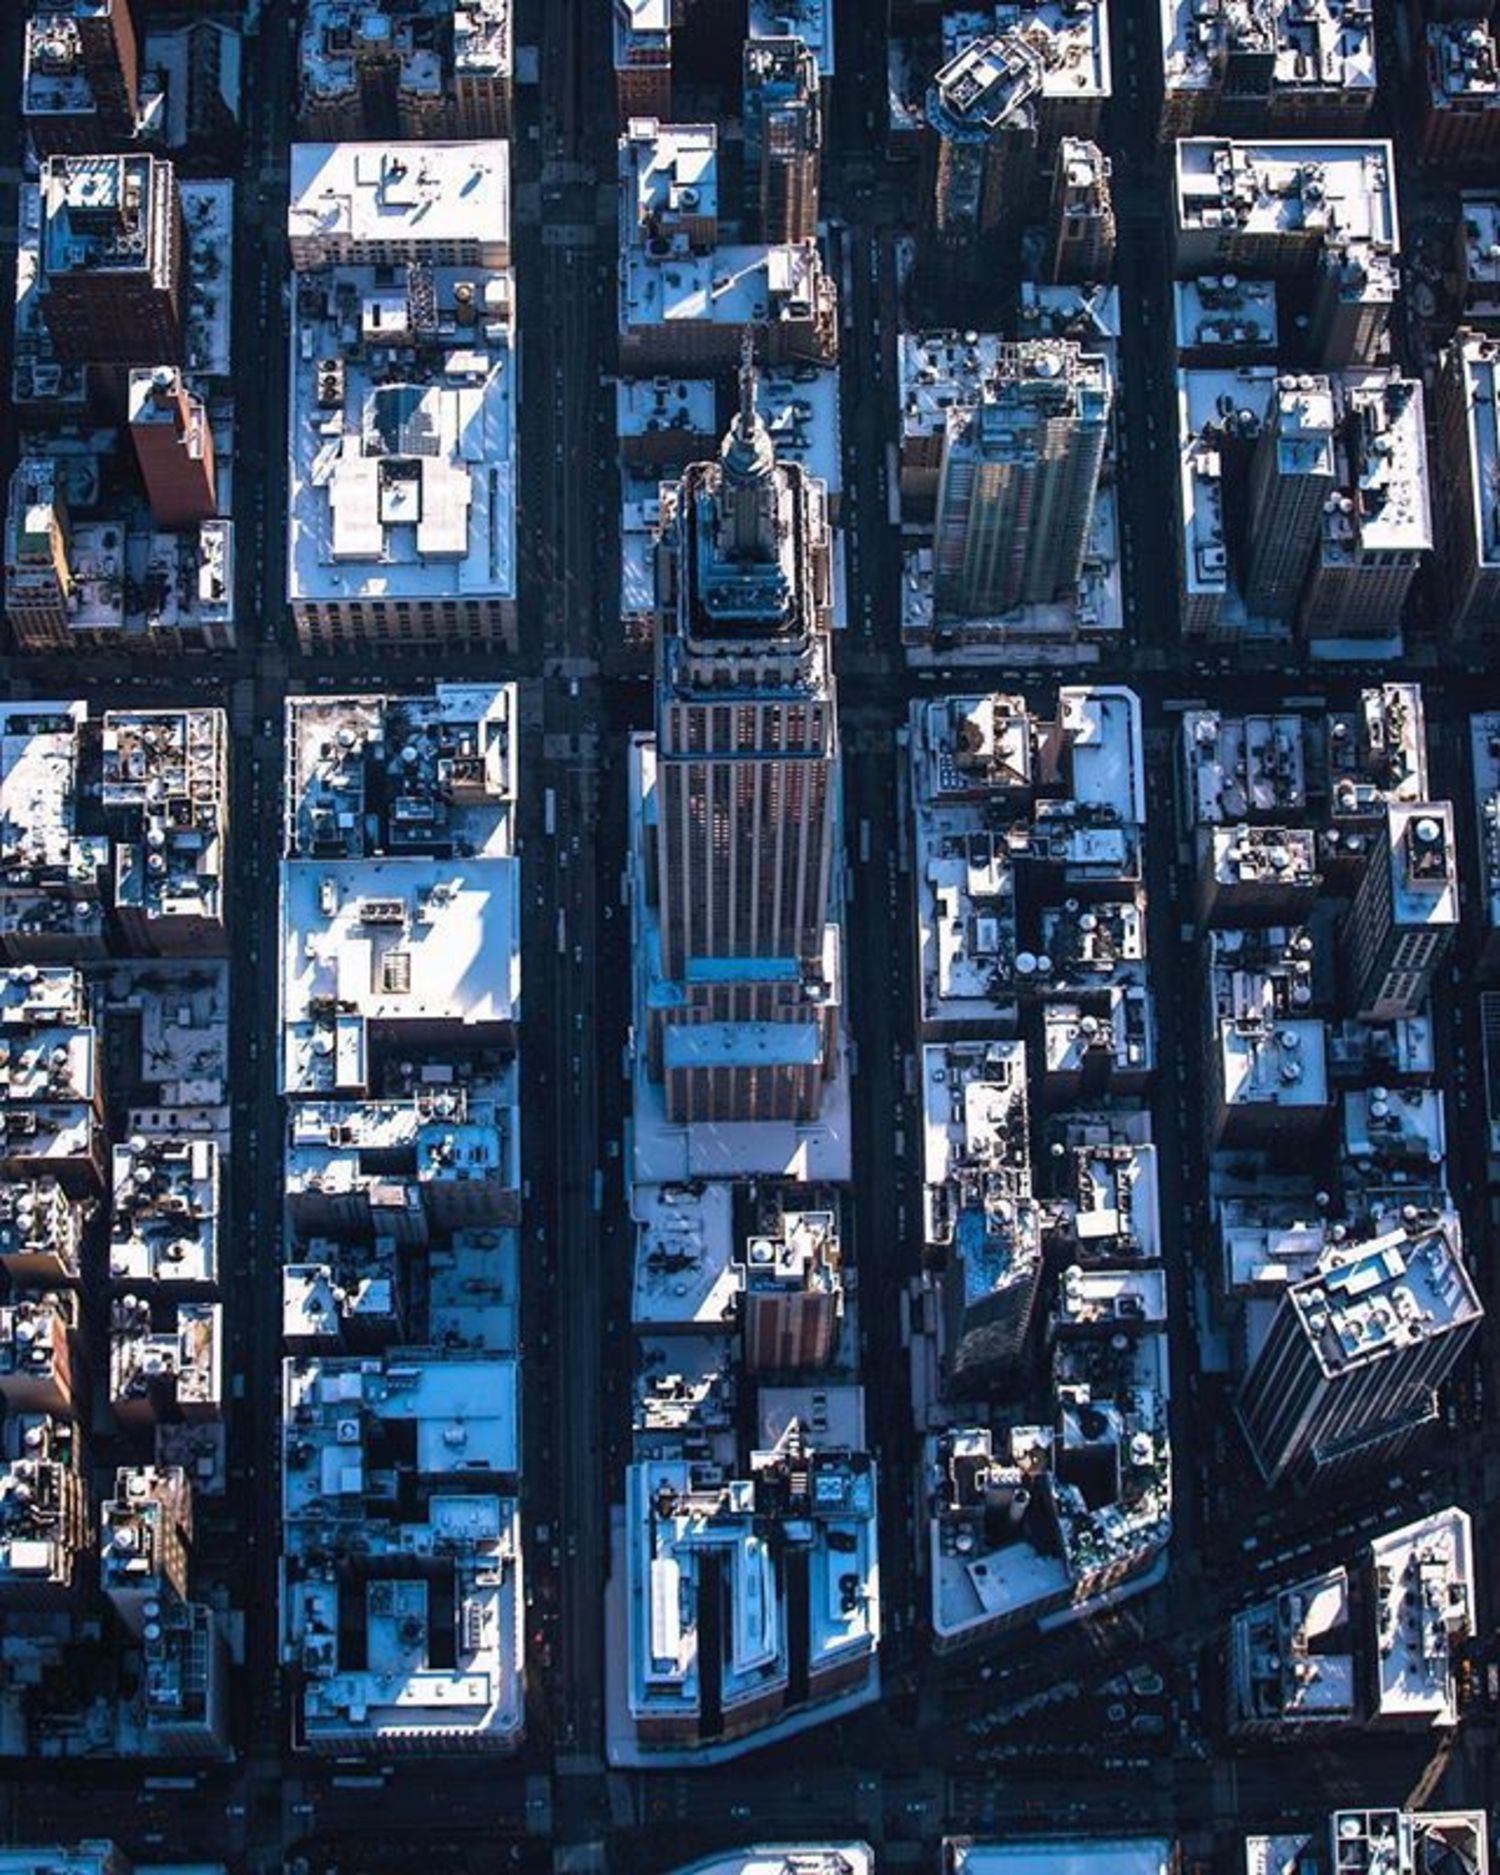 Empire State Building, New York, New York. Photo via @craigsbeds #viewingnyc #newyork #newyorkcity #nyc #empirestatebuilding